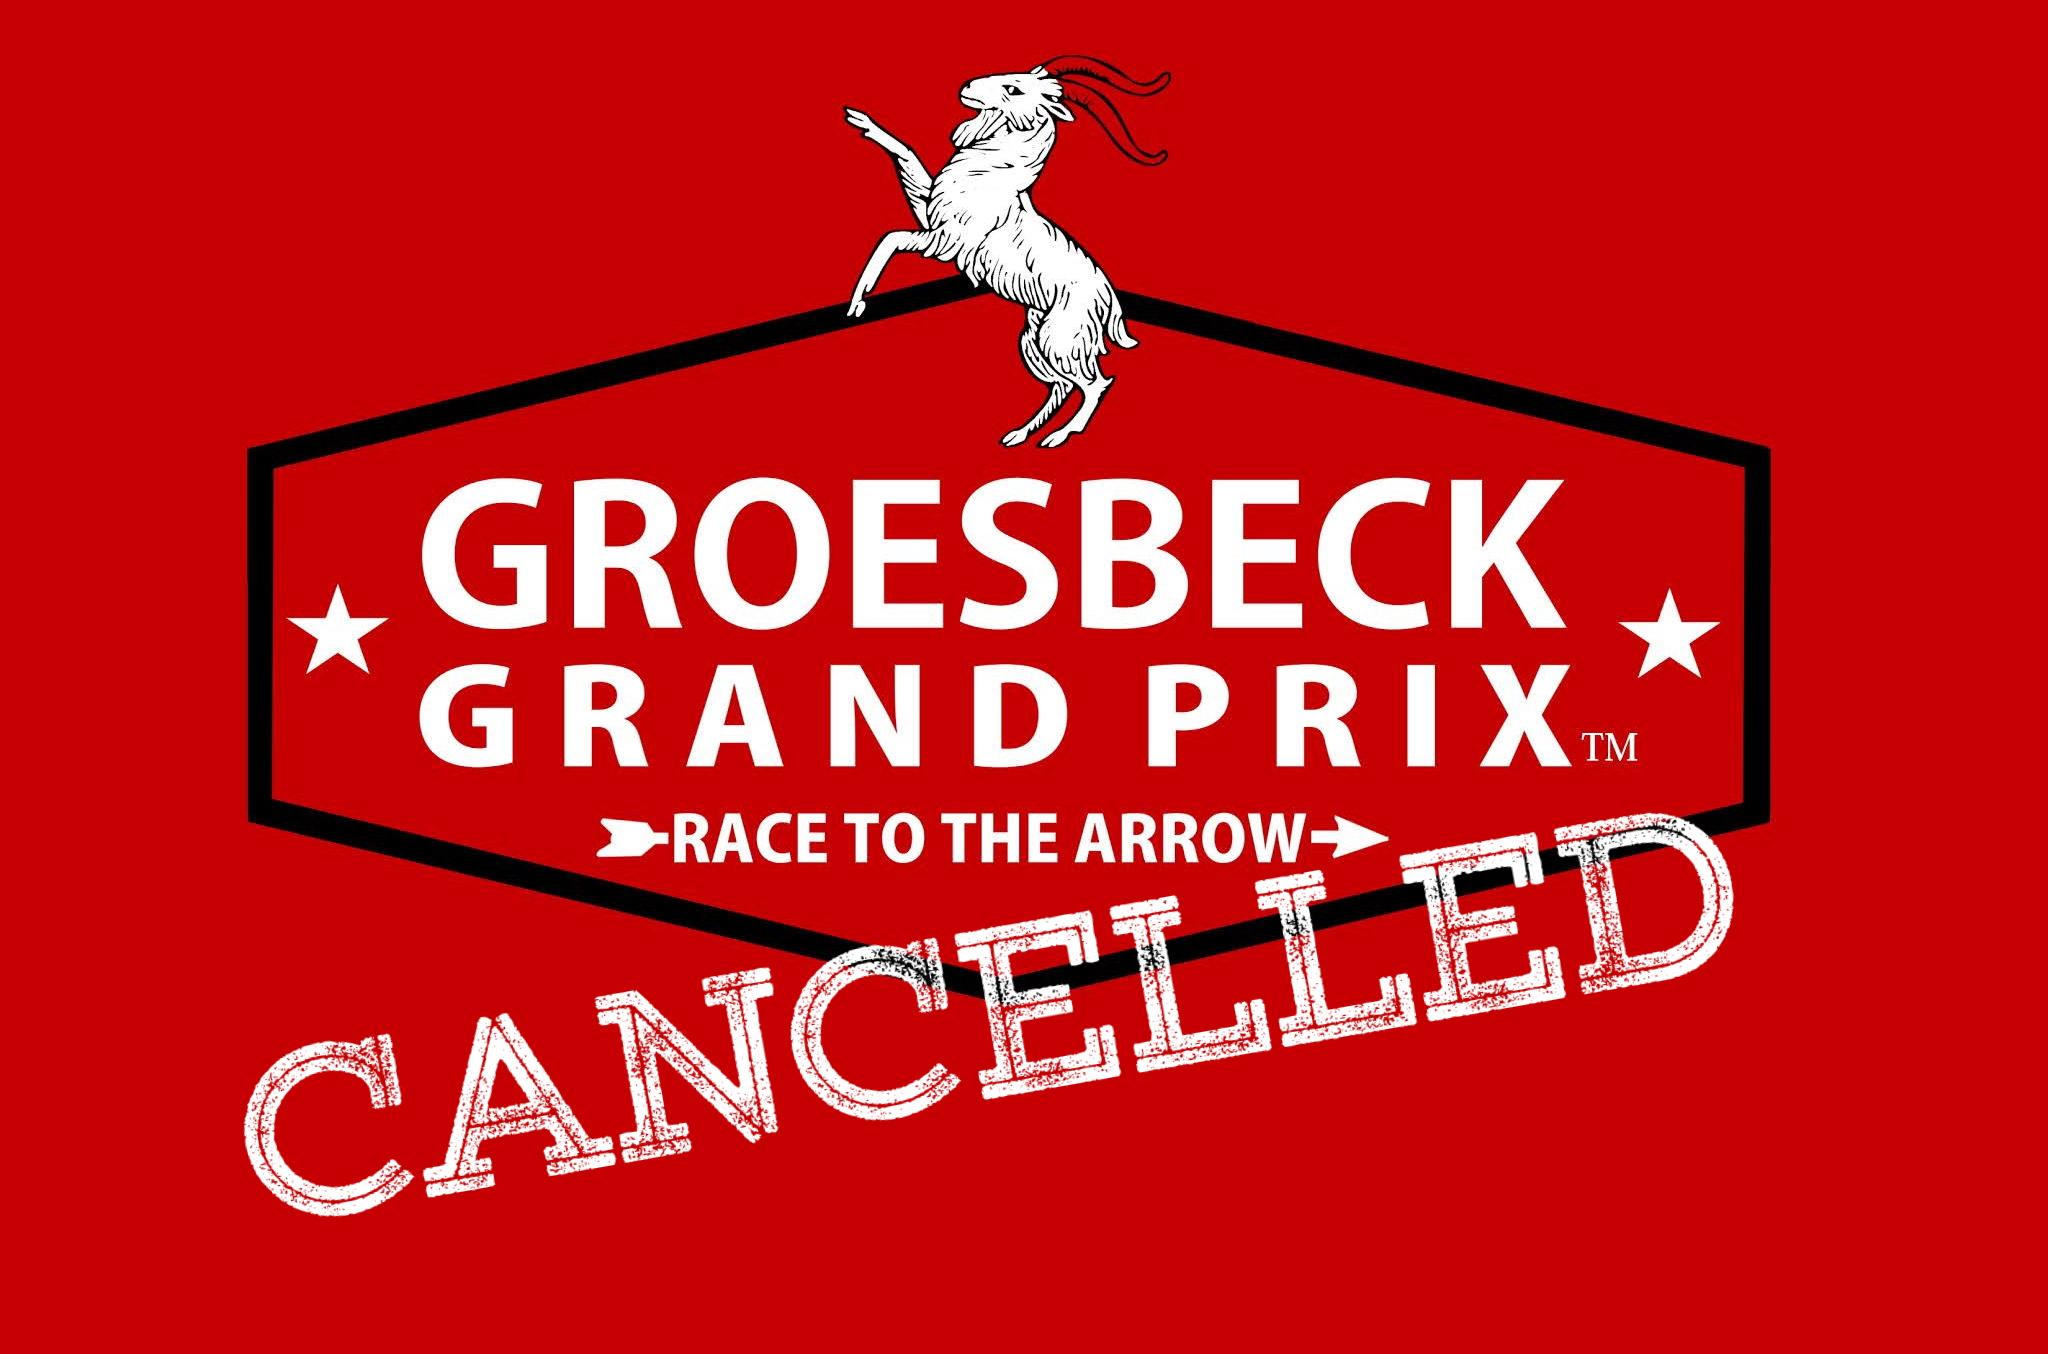 2021 Groesbeck Grand Prix Cancelled